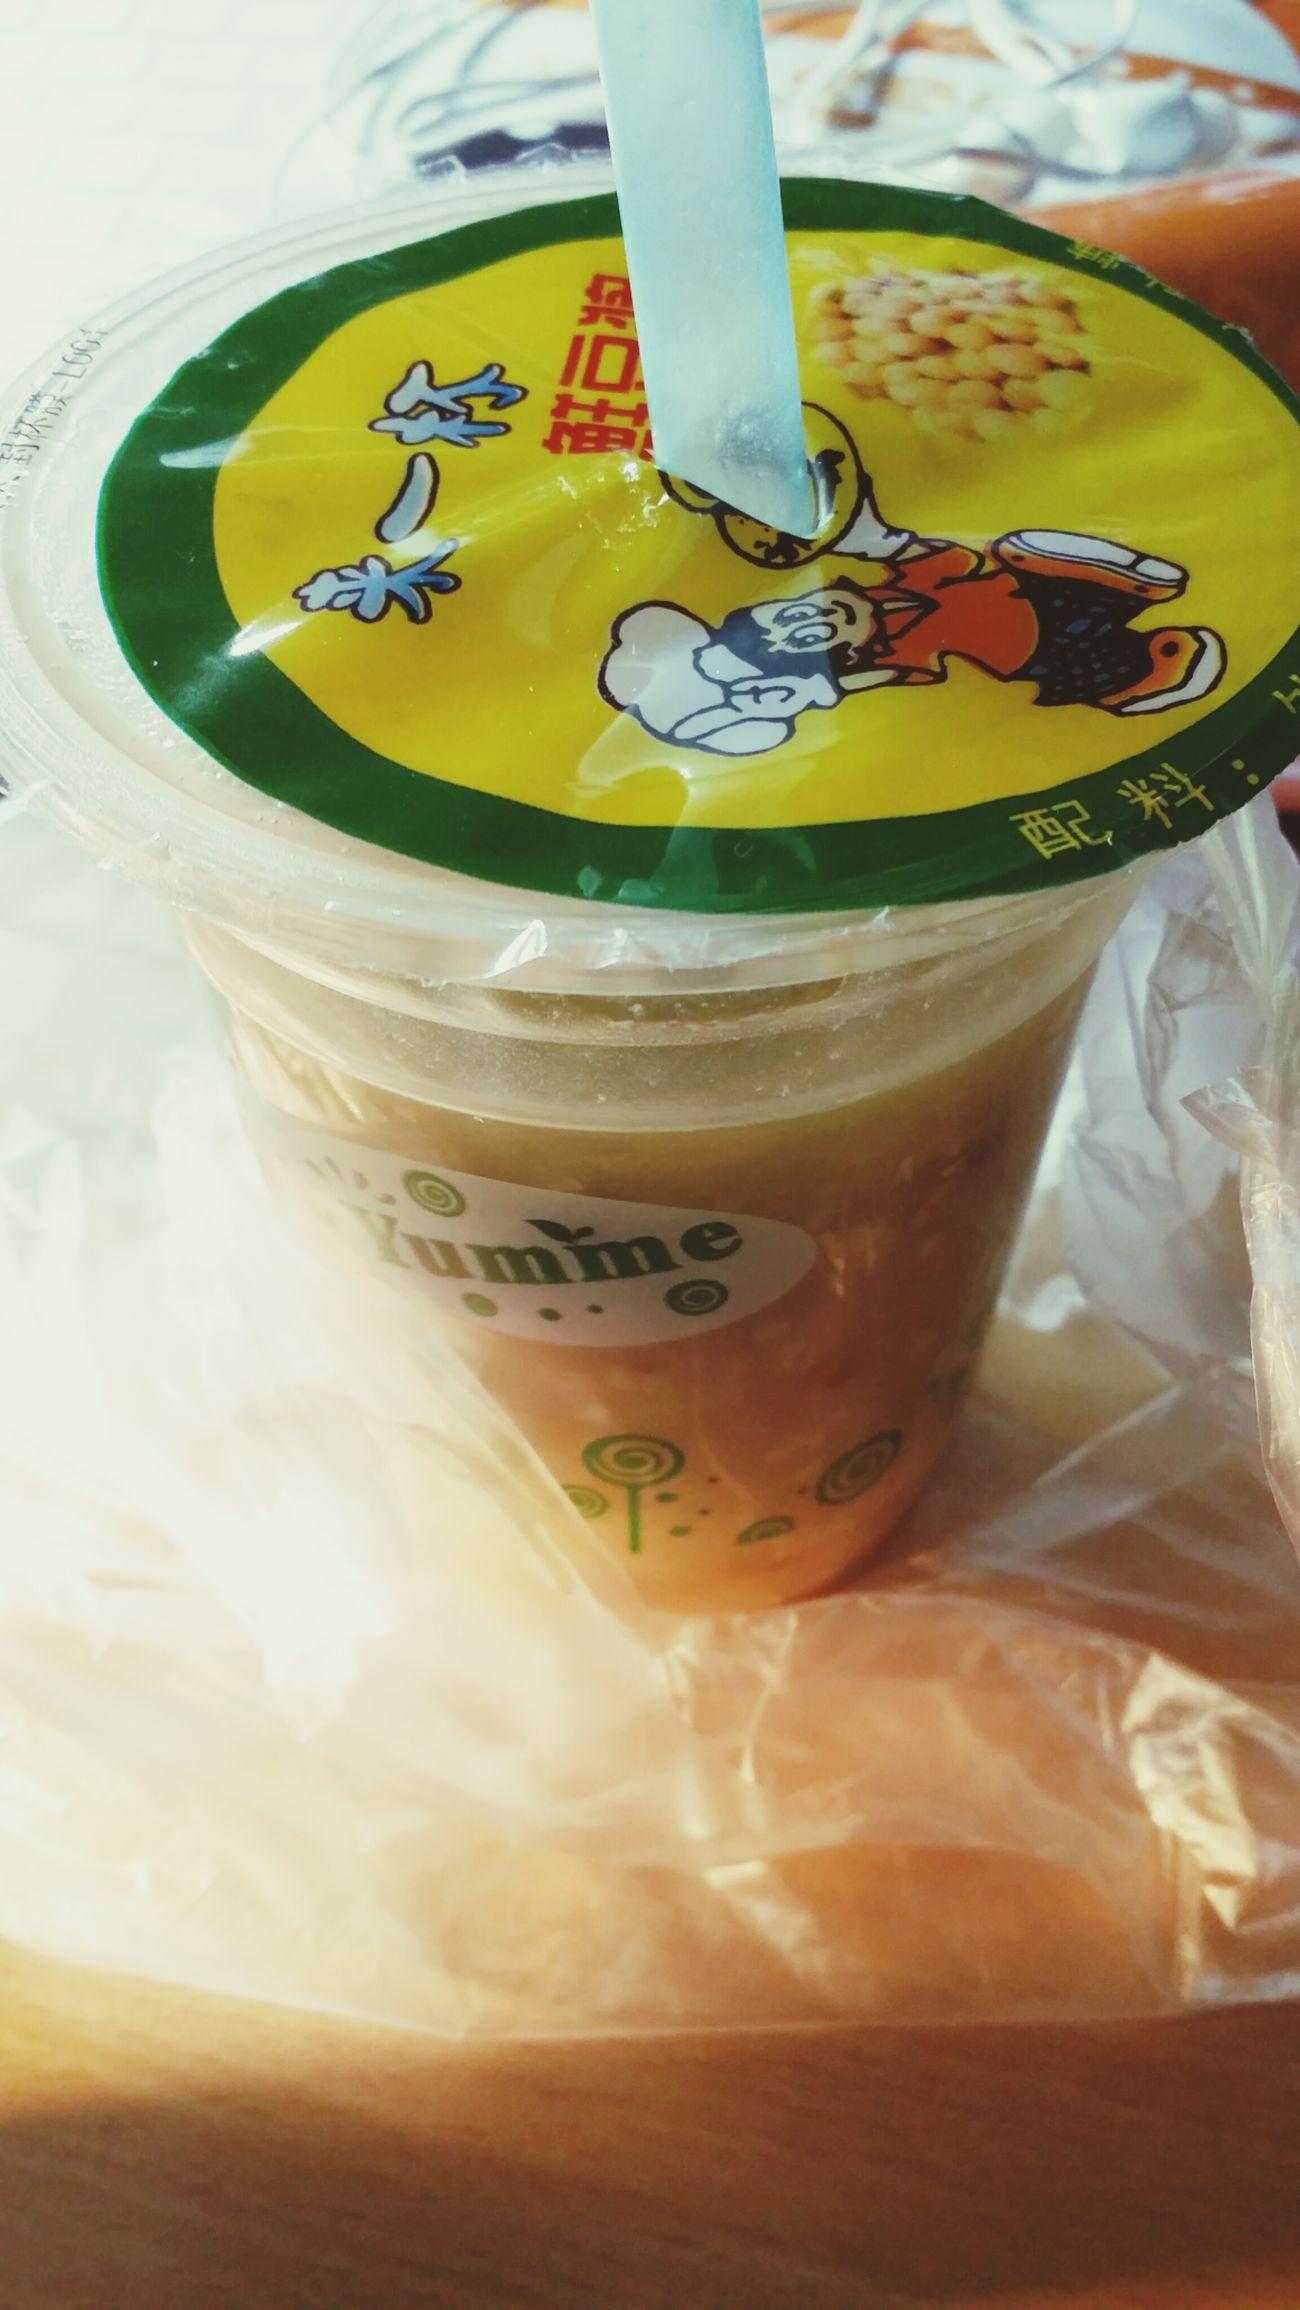 Dinner Time 小米粥?